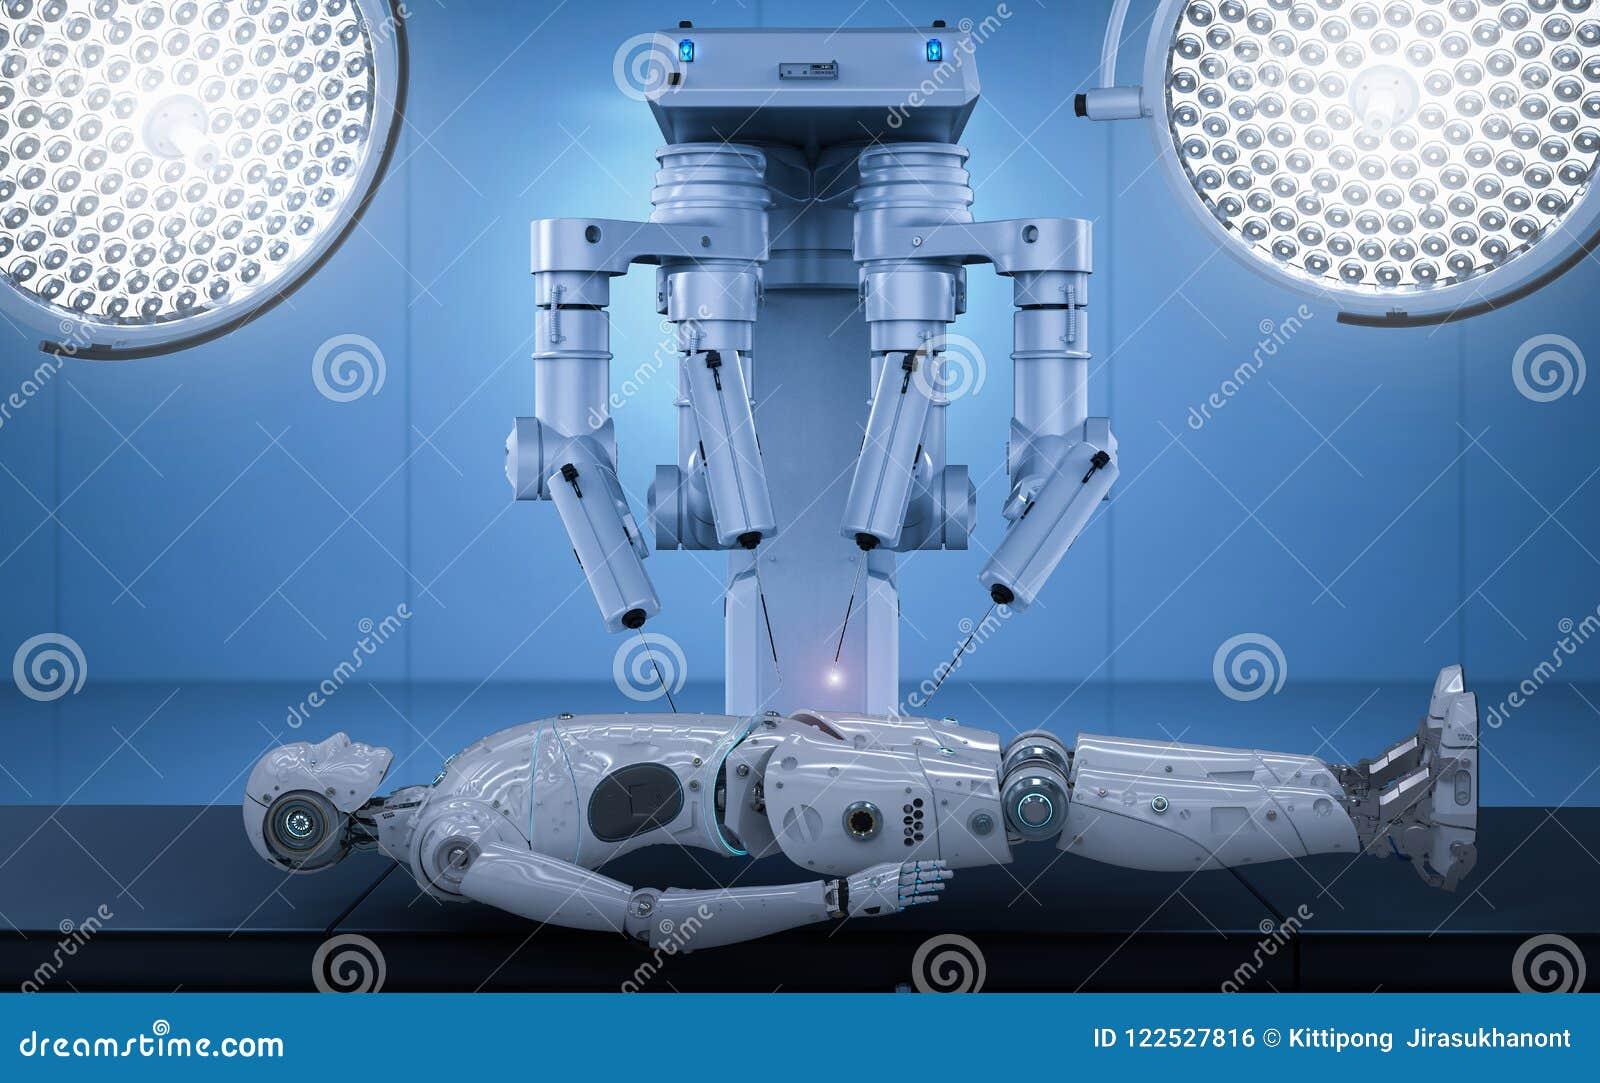 Robot surgery maintenance ai cyborg